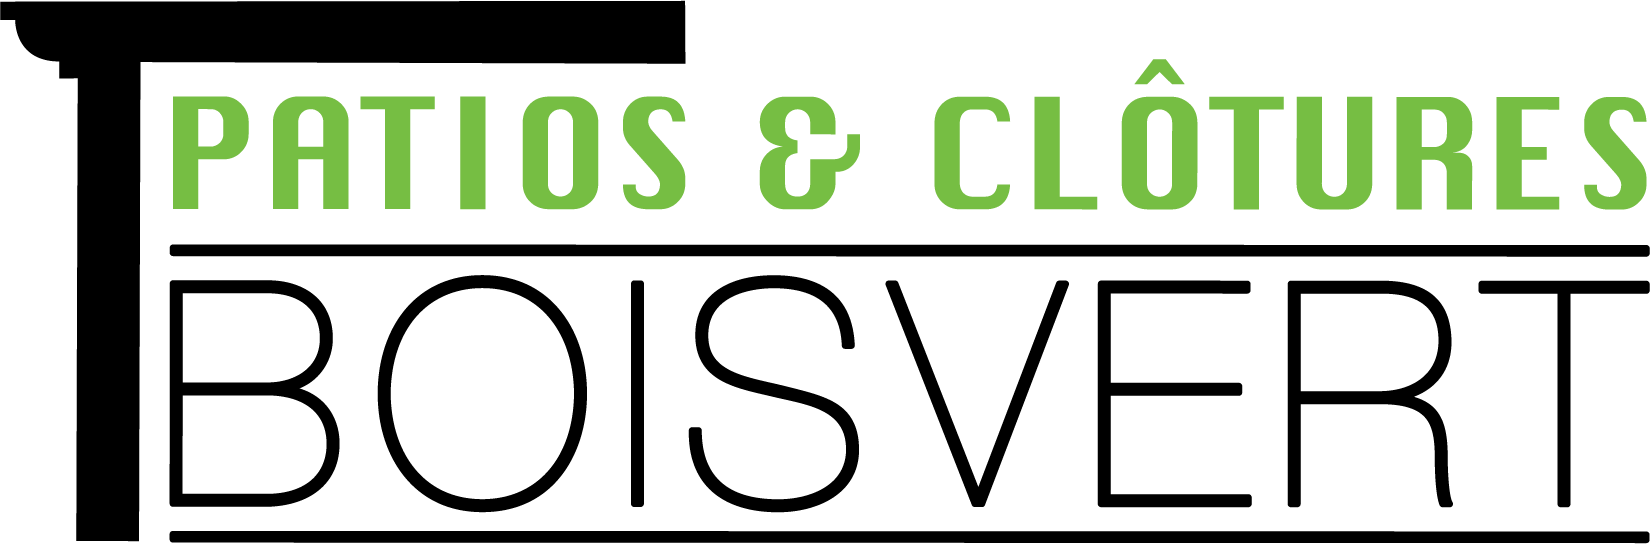 logo_Patios&Clôtures Boisvert-noir